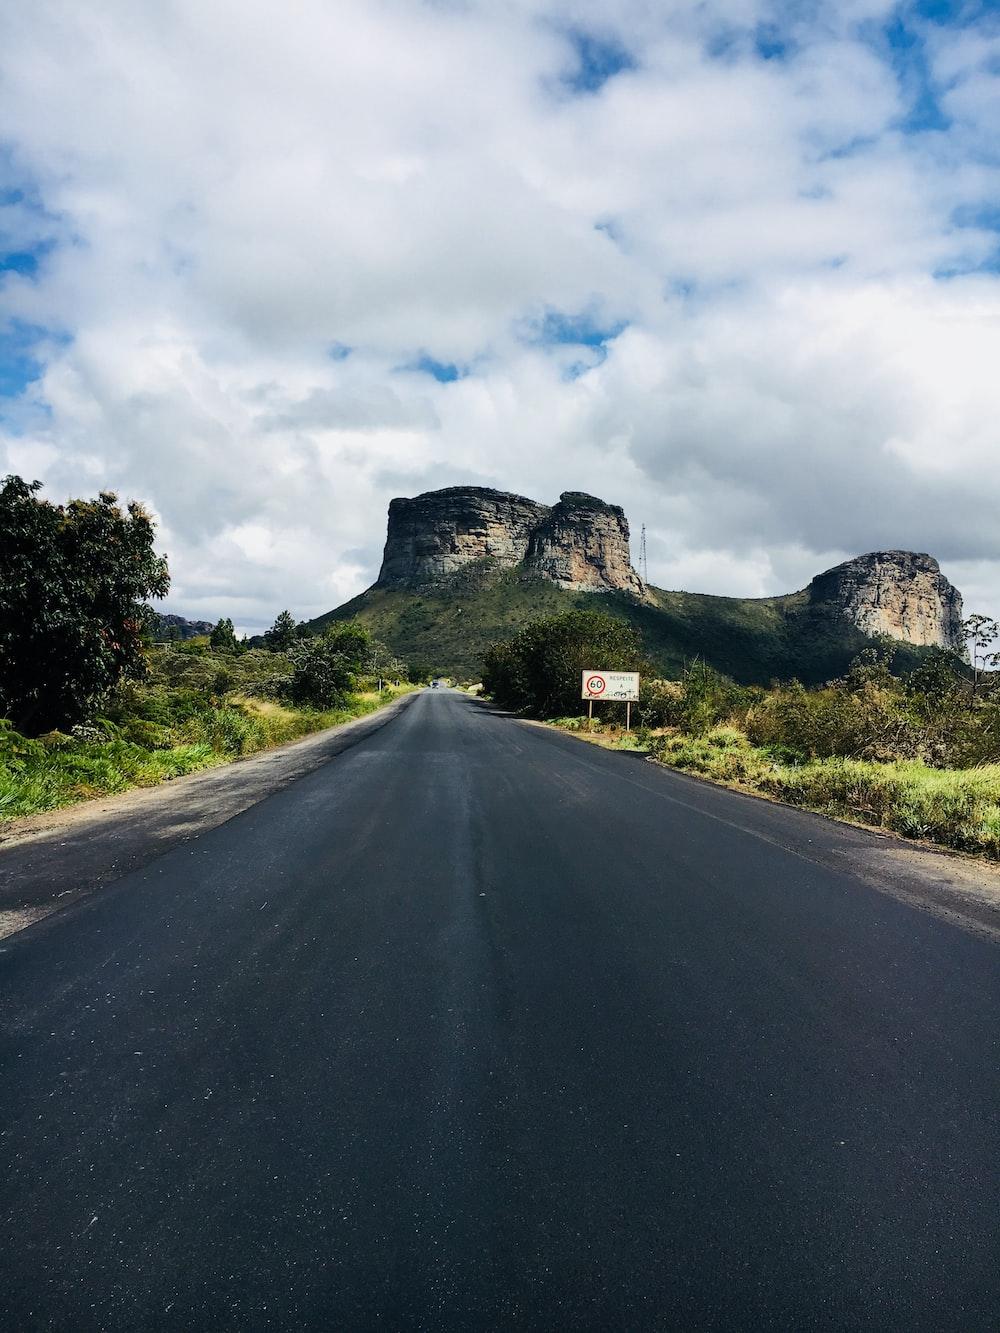 gray concrete road near mountain